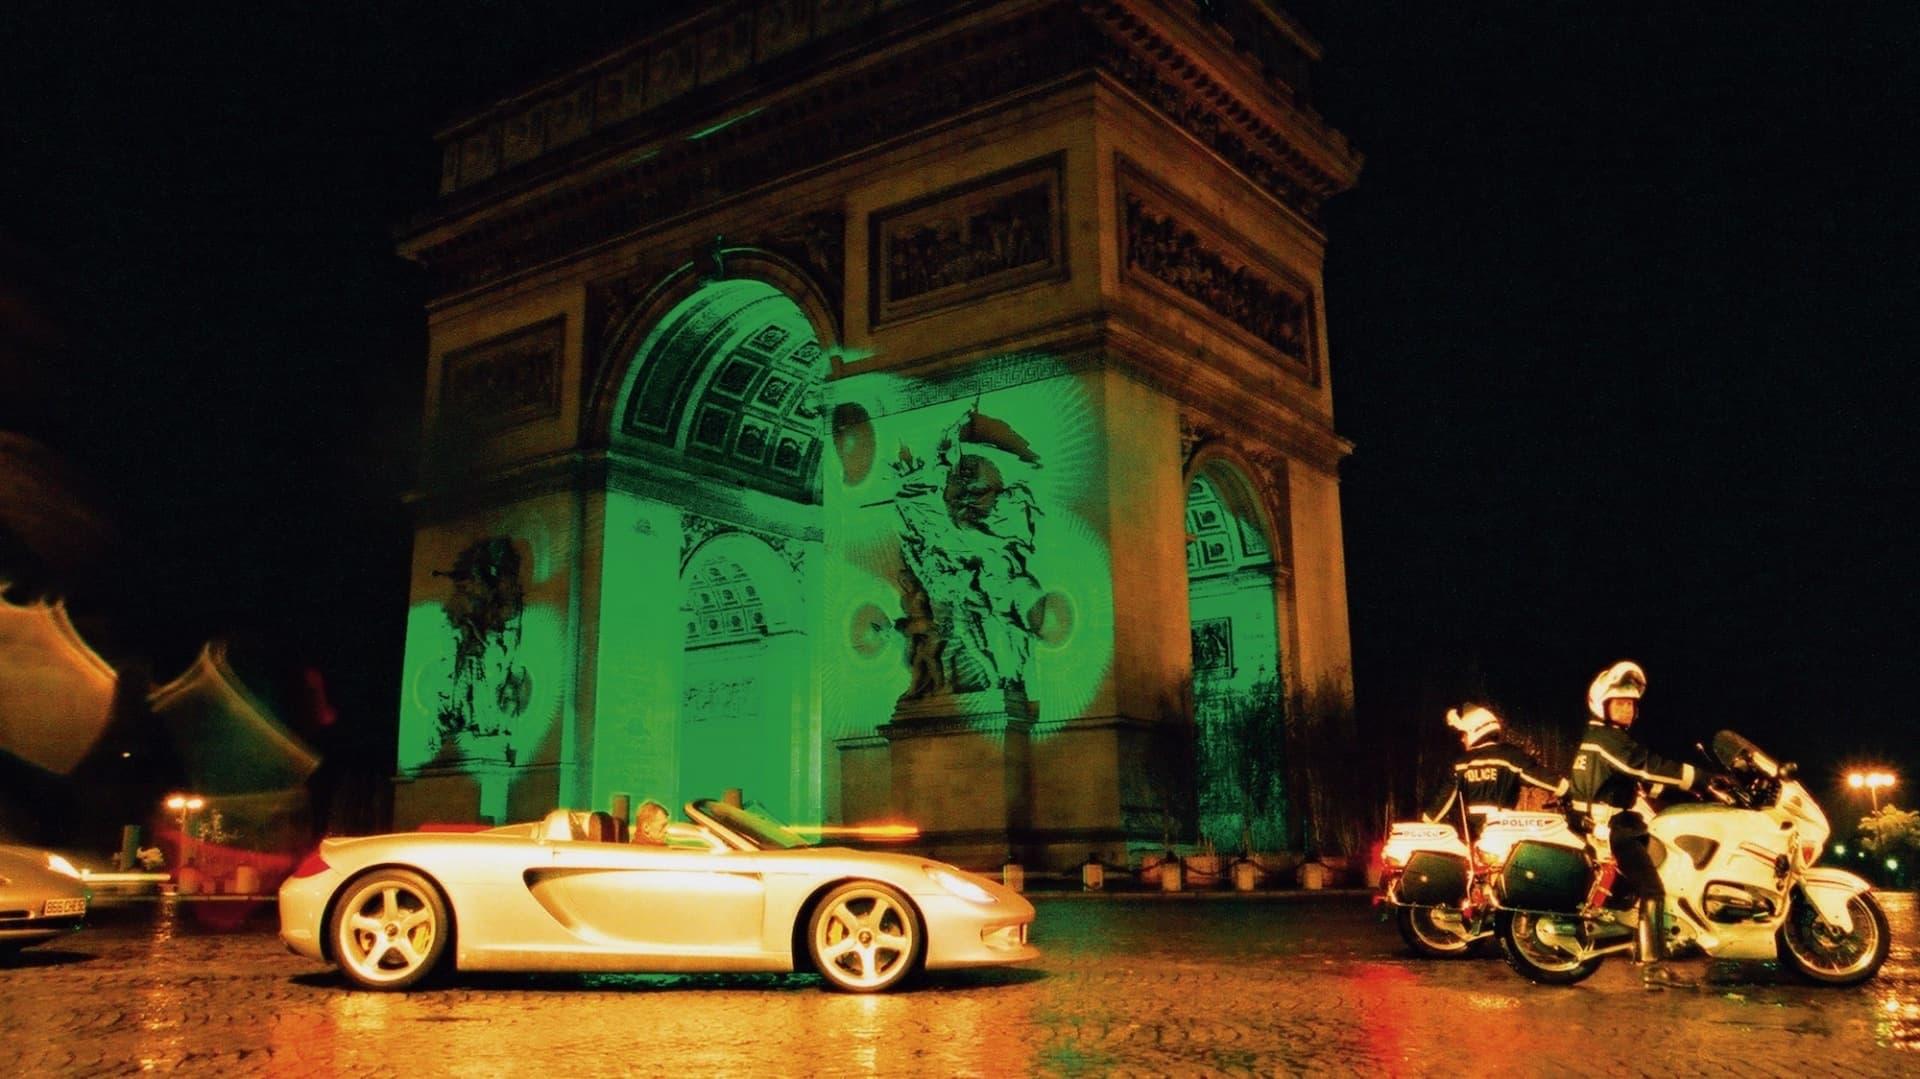 Porsche Carrera Gt 20 Anos 02